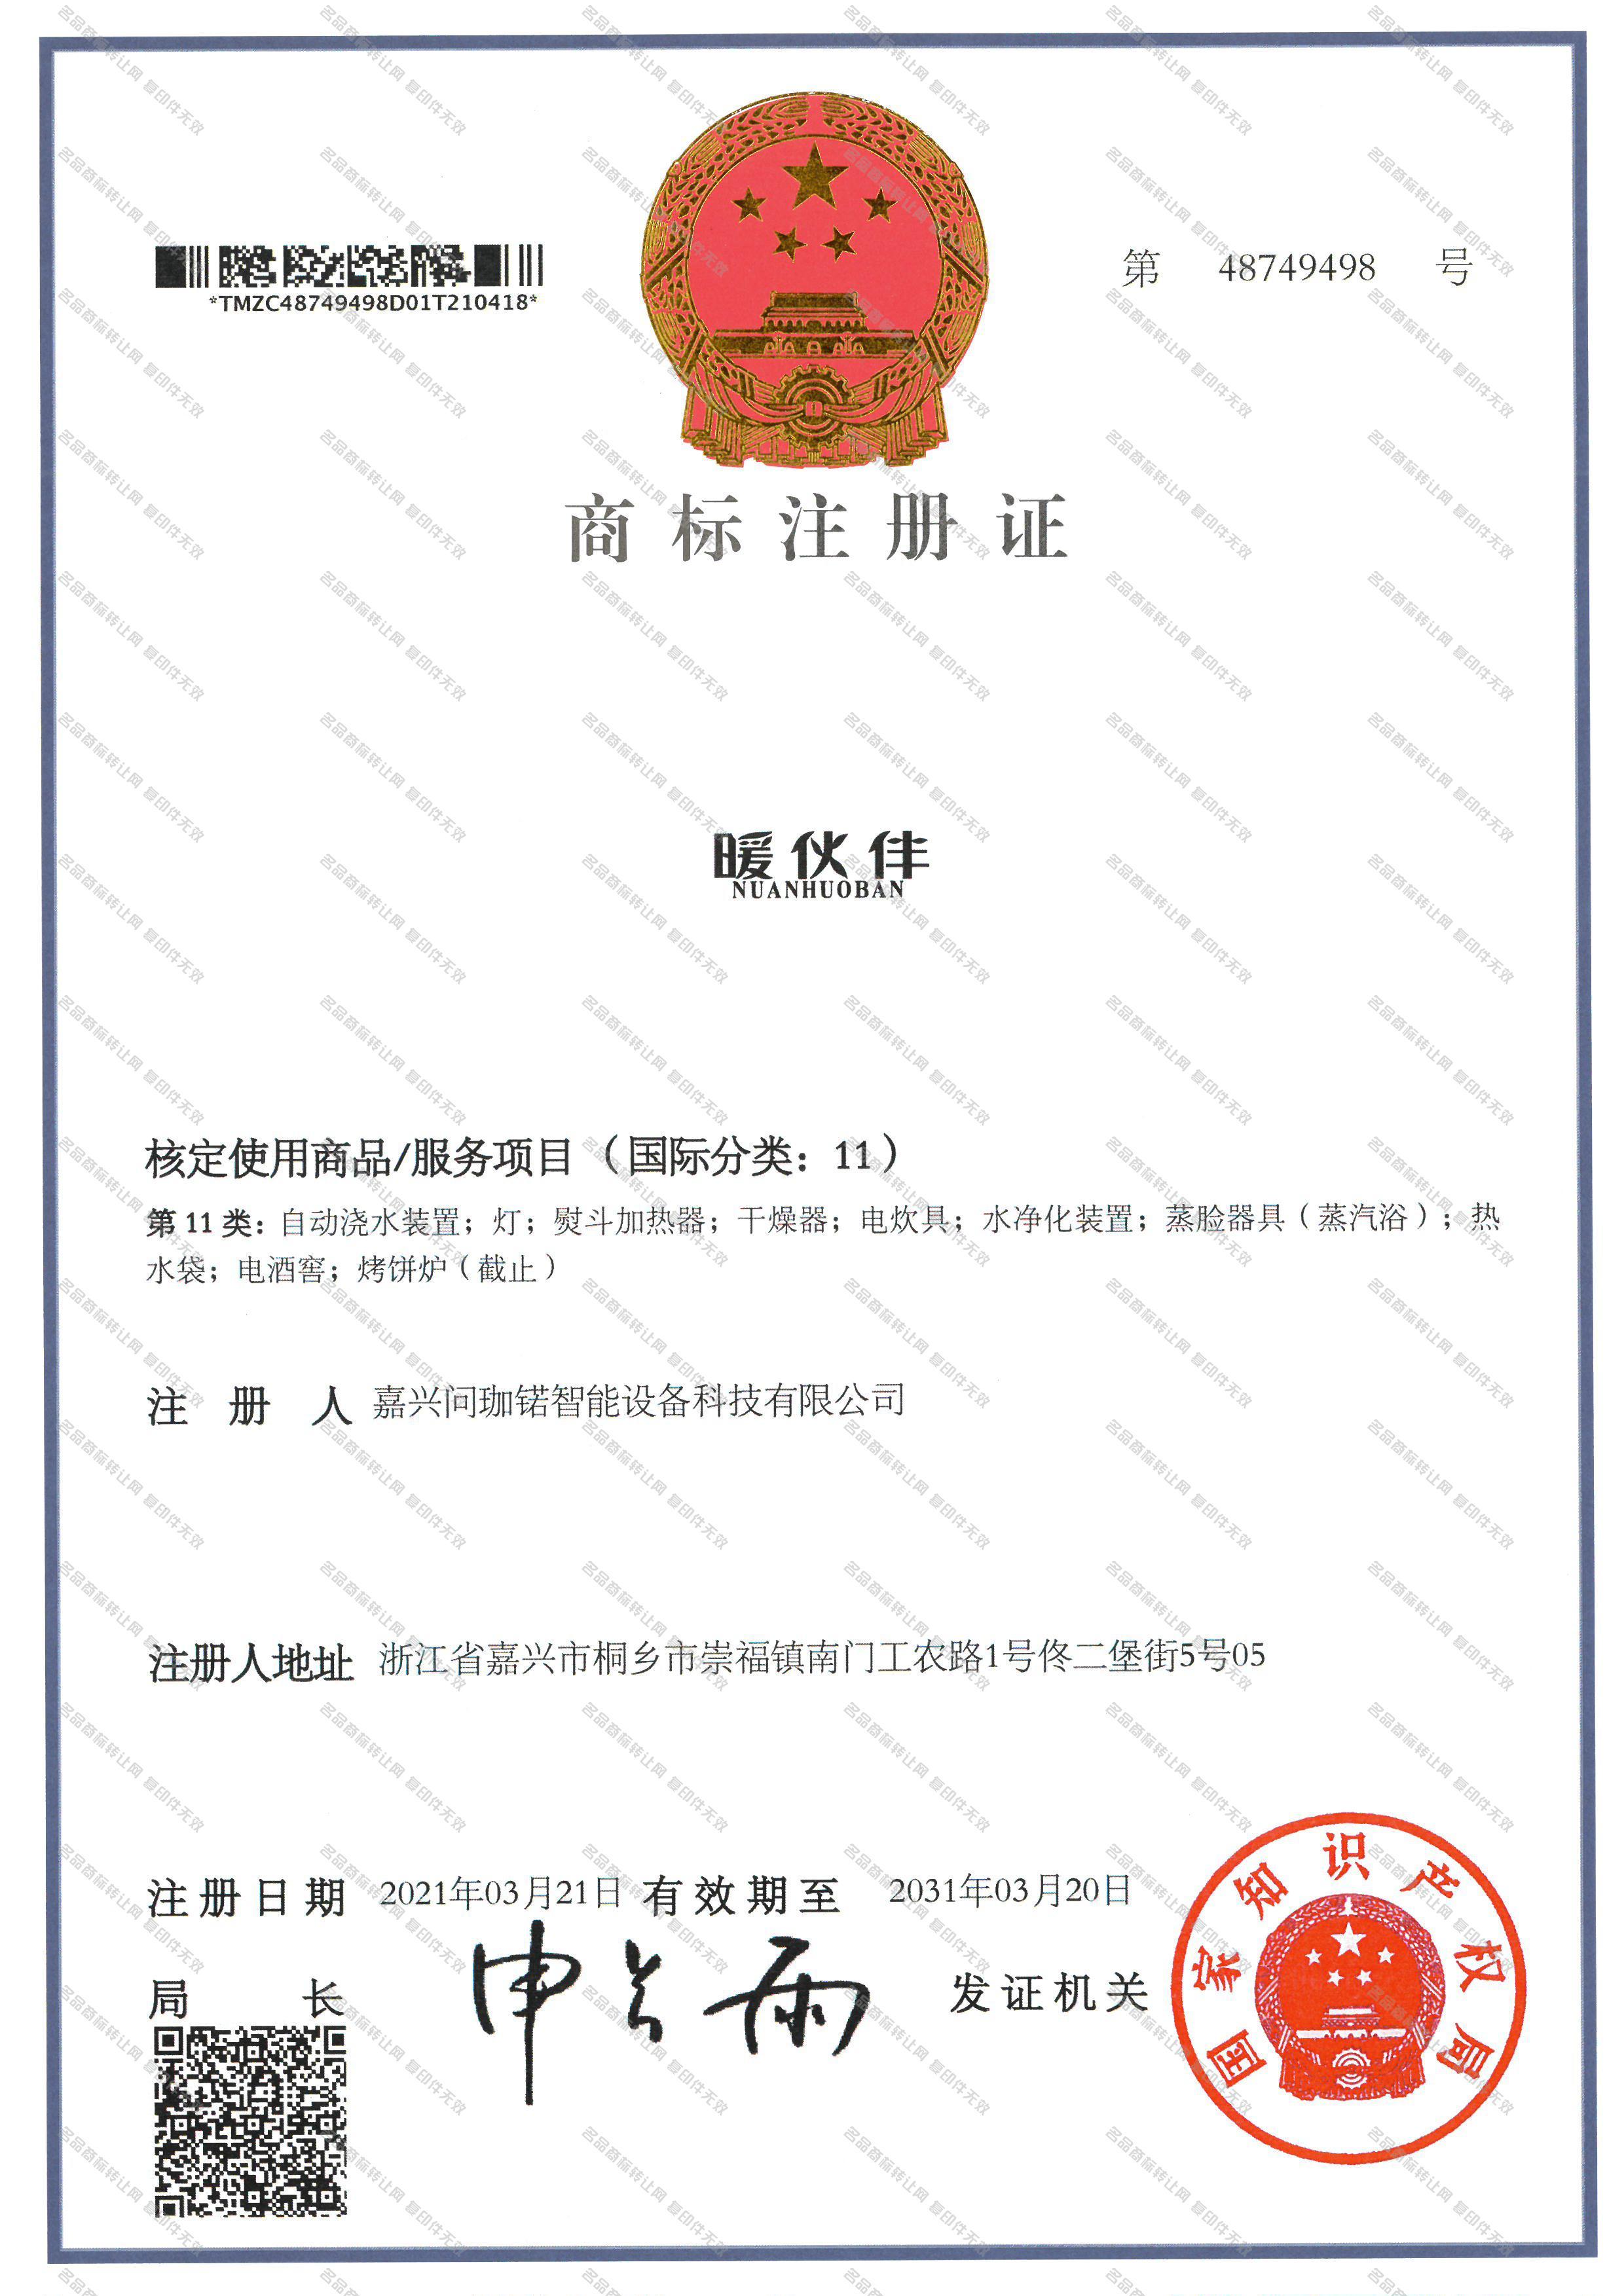 暖伙伴;NUANHUOBAN注册证